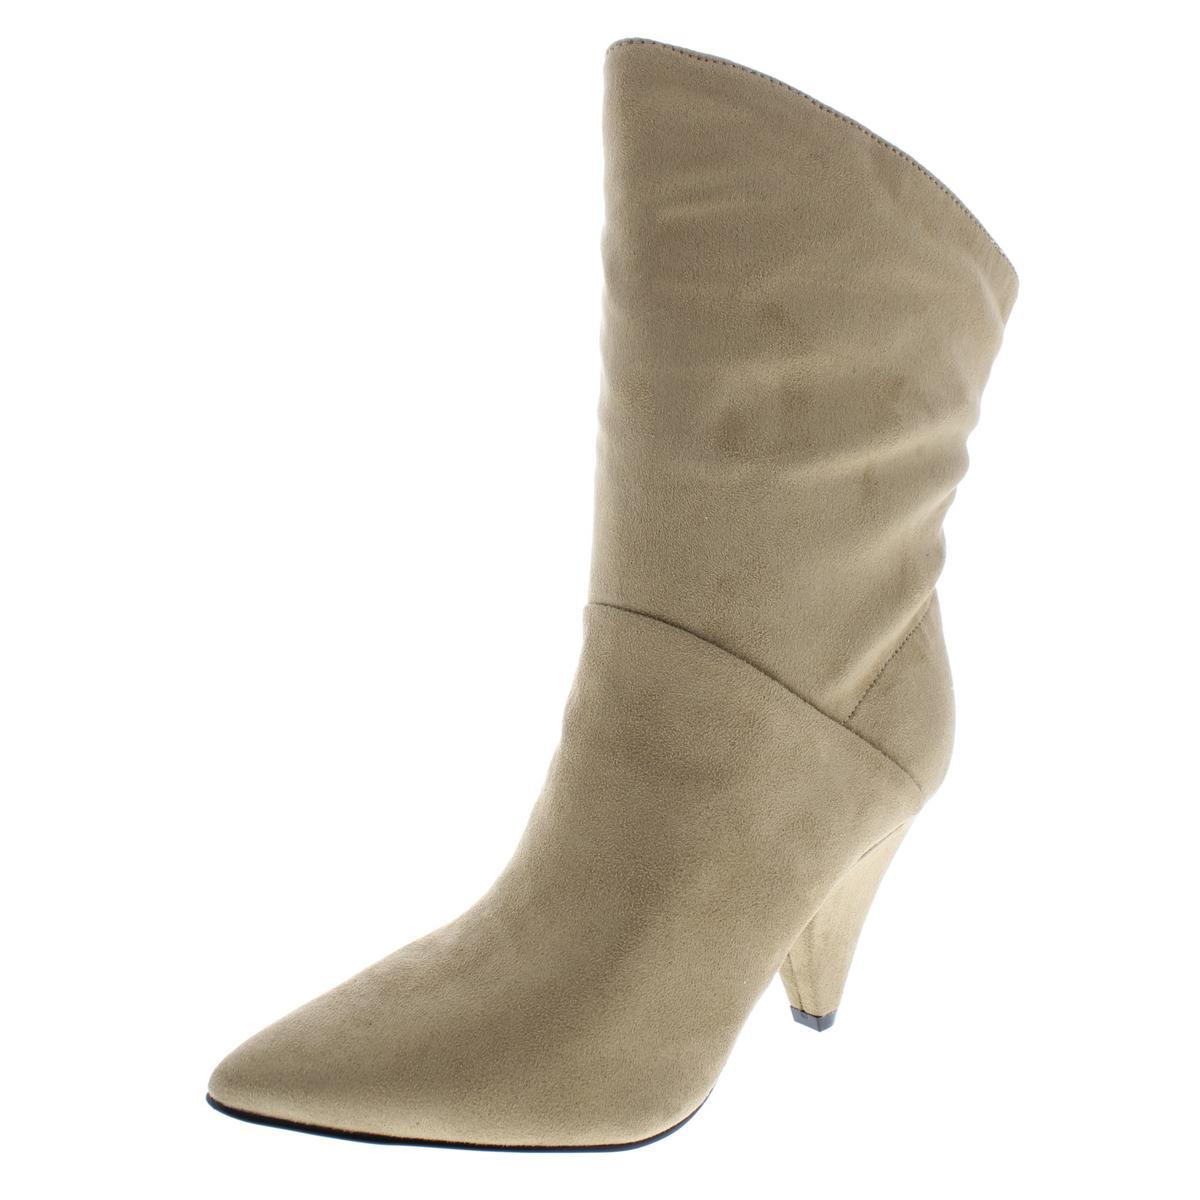 Indigo Tan Rd. Damenschuhe Gerald 2 Tan Indigo Ankle Stiefel Schuhes 7.5 Medium (B,M ... 2437f0